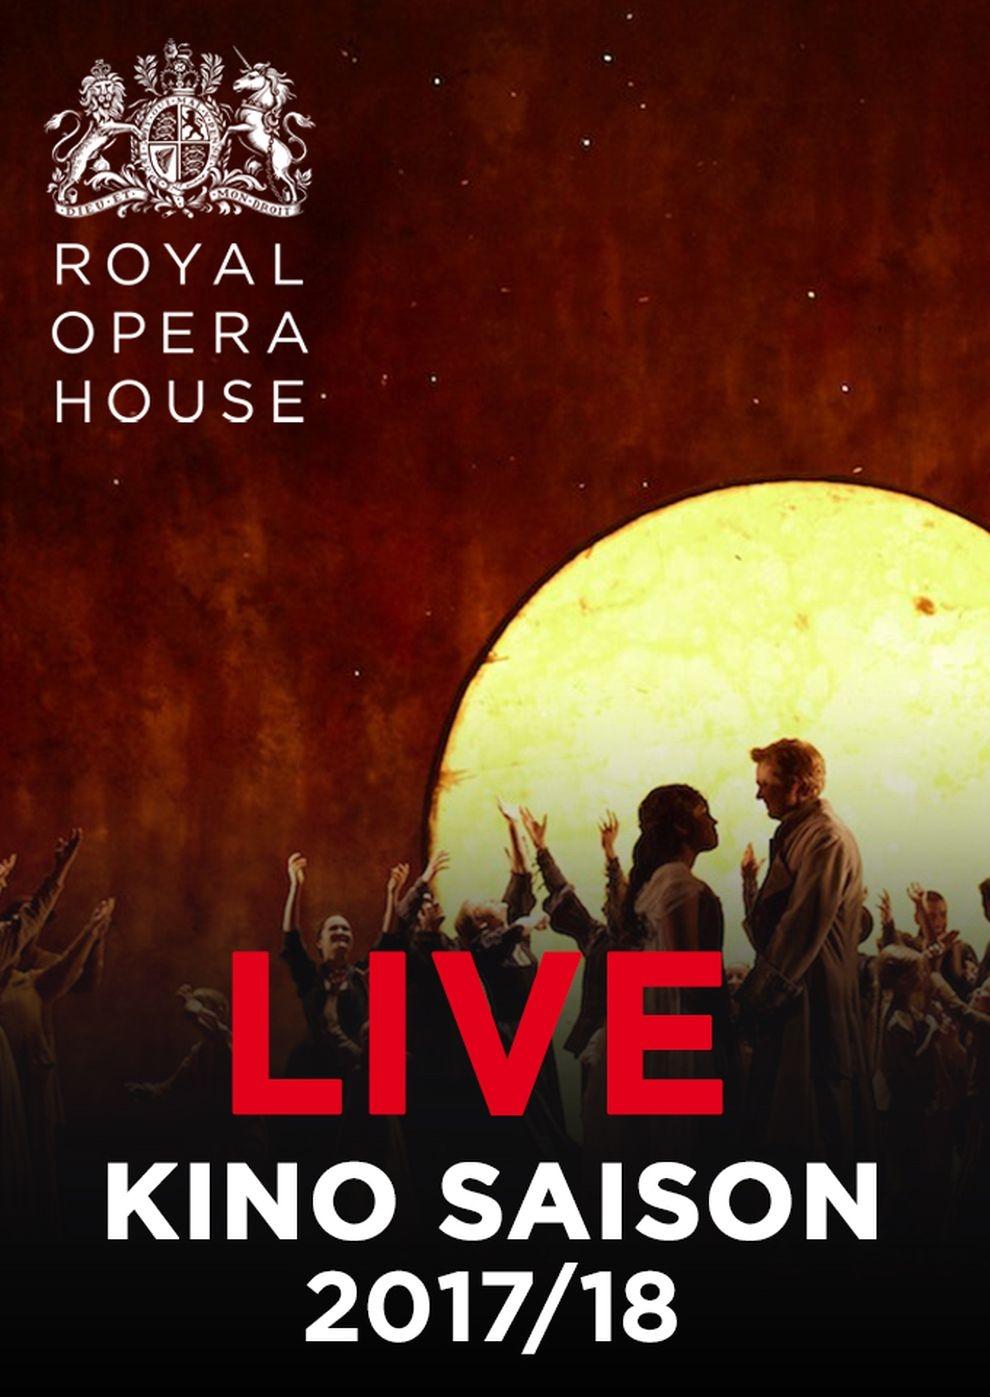 Royal Opera House 2017/18: Die Zauberflöte (Poster)